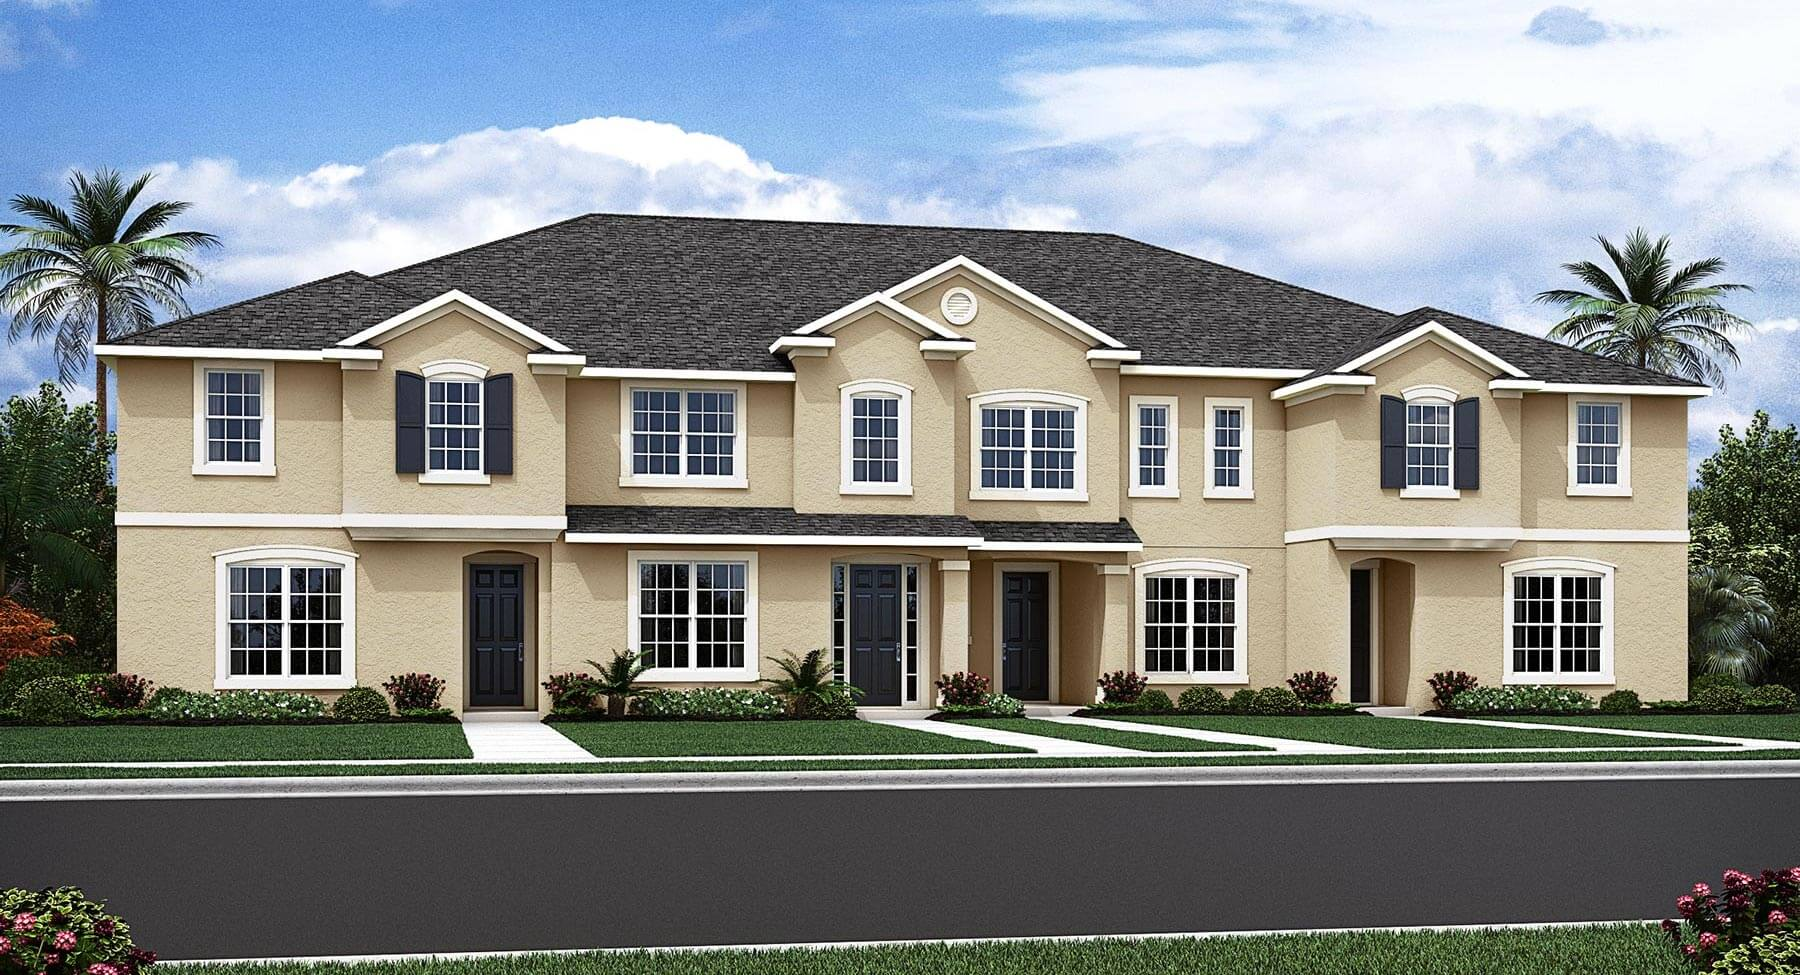 Destino: Solara Resort - Orlando